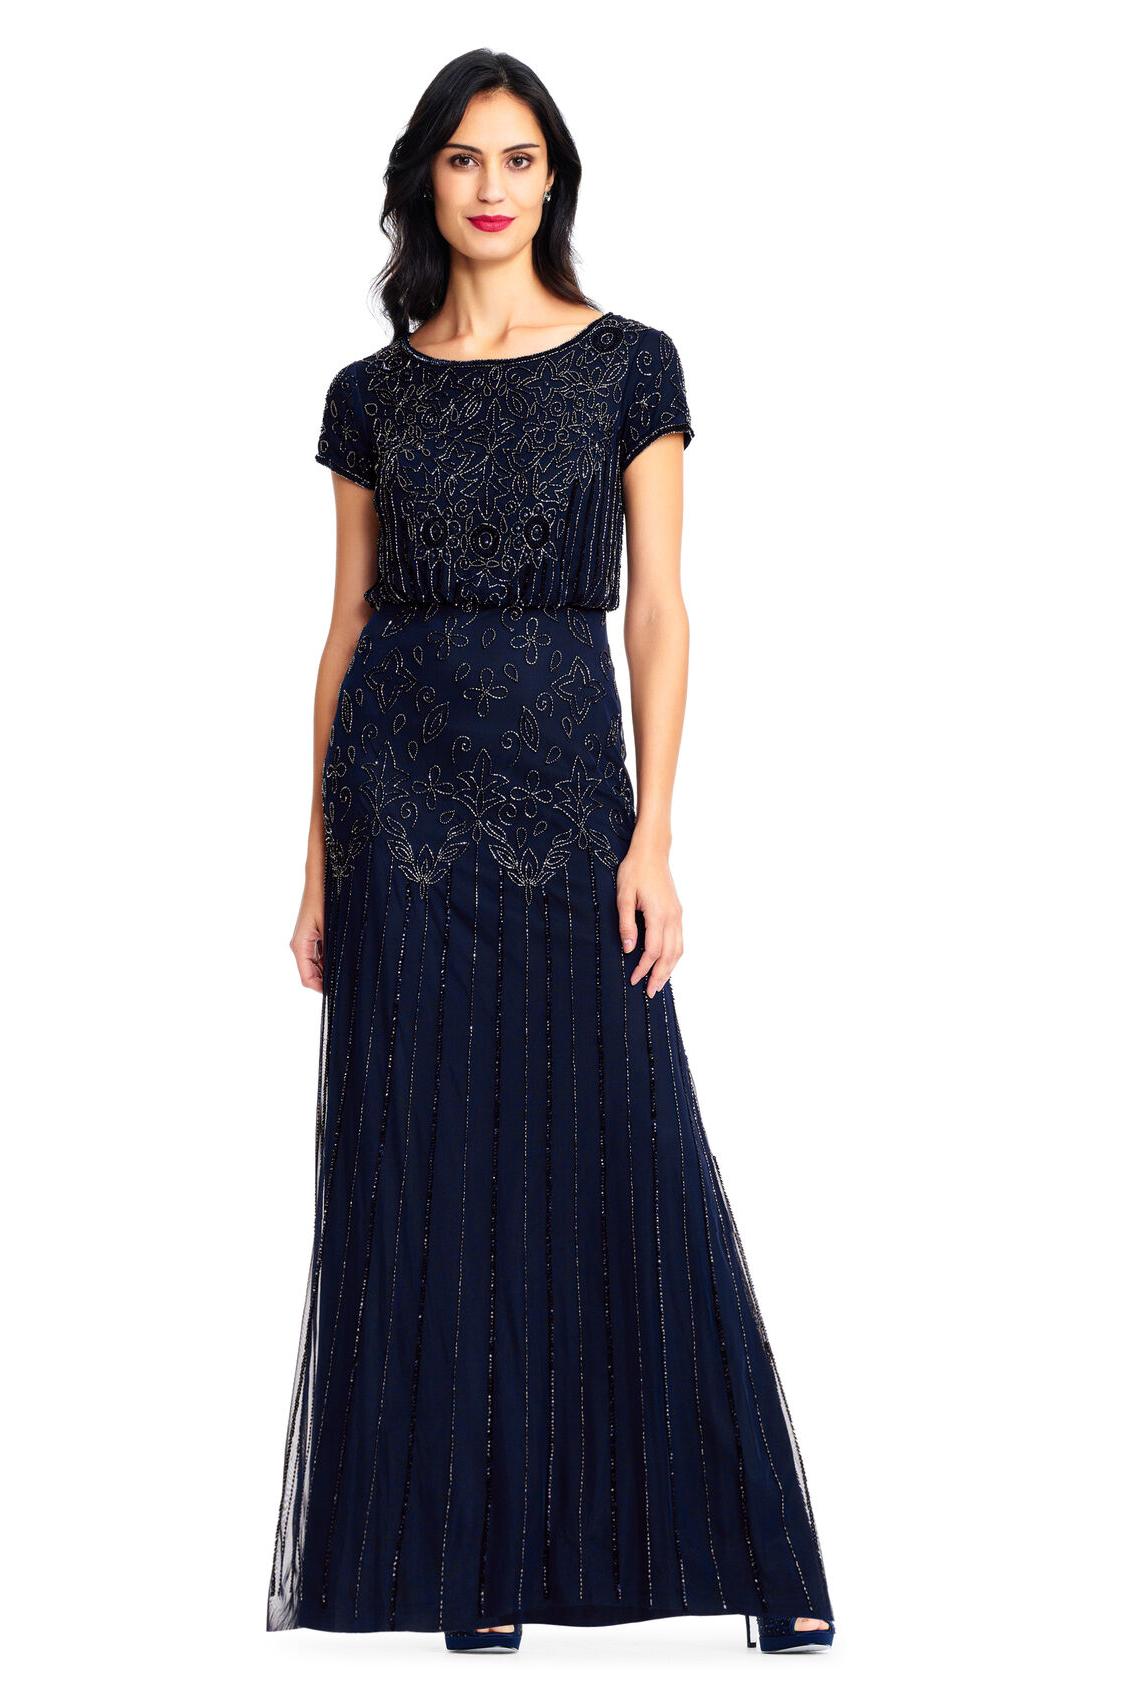 Nina Short Sleeve Blouson Beaded Gown By Adrianna Papell - Navy